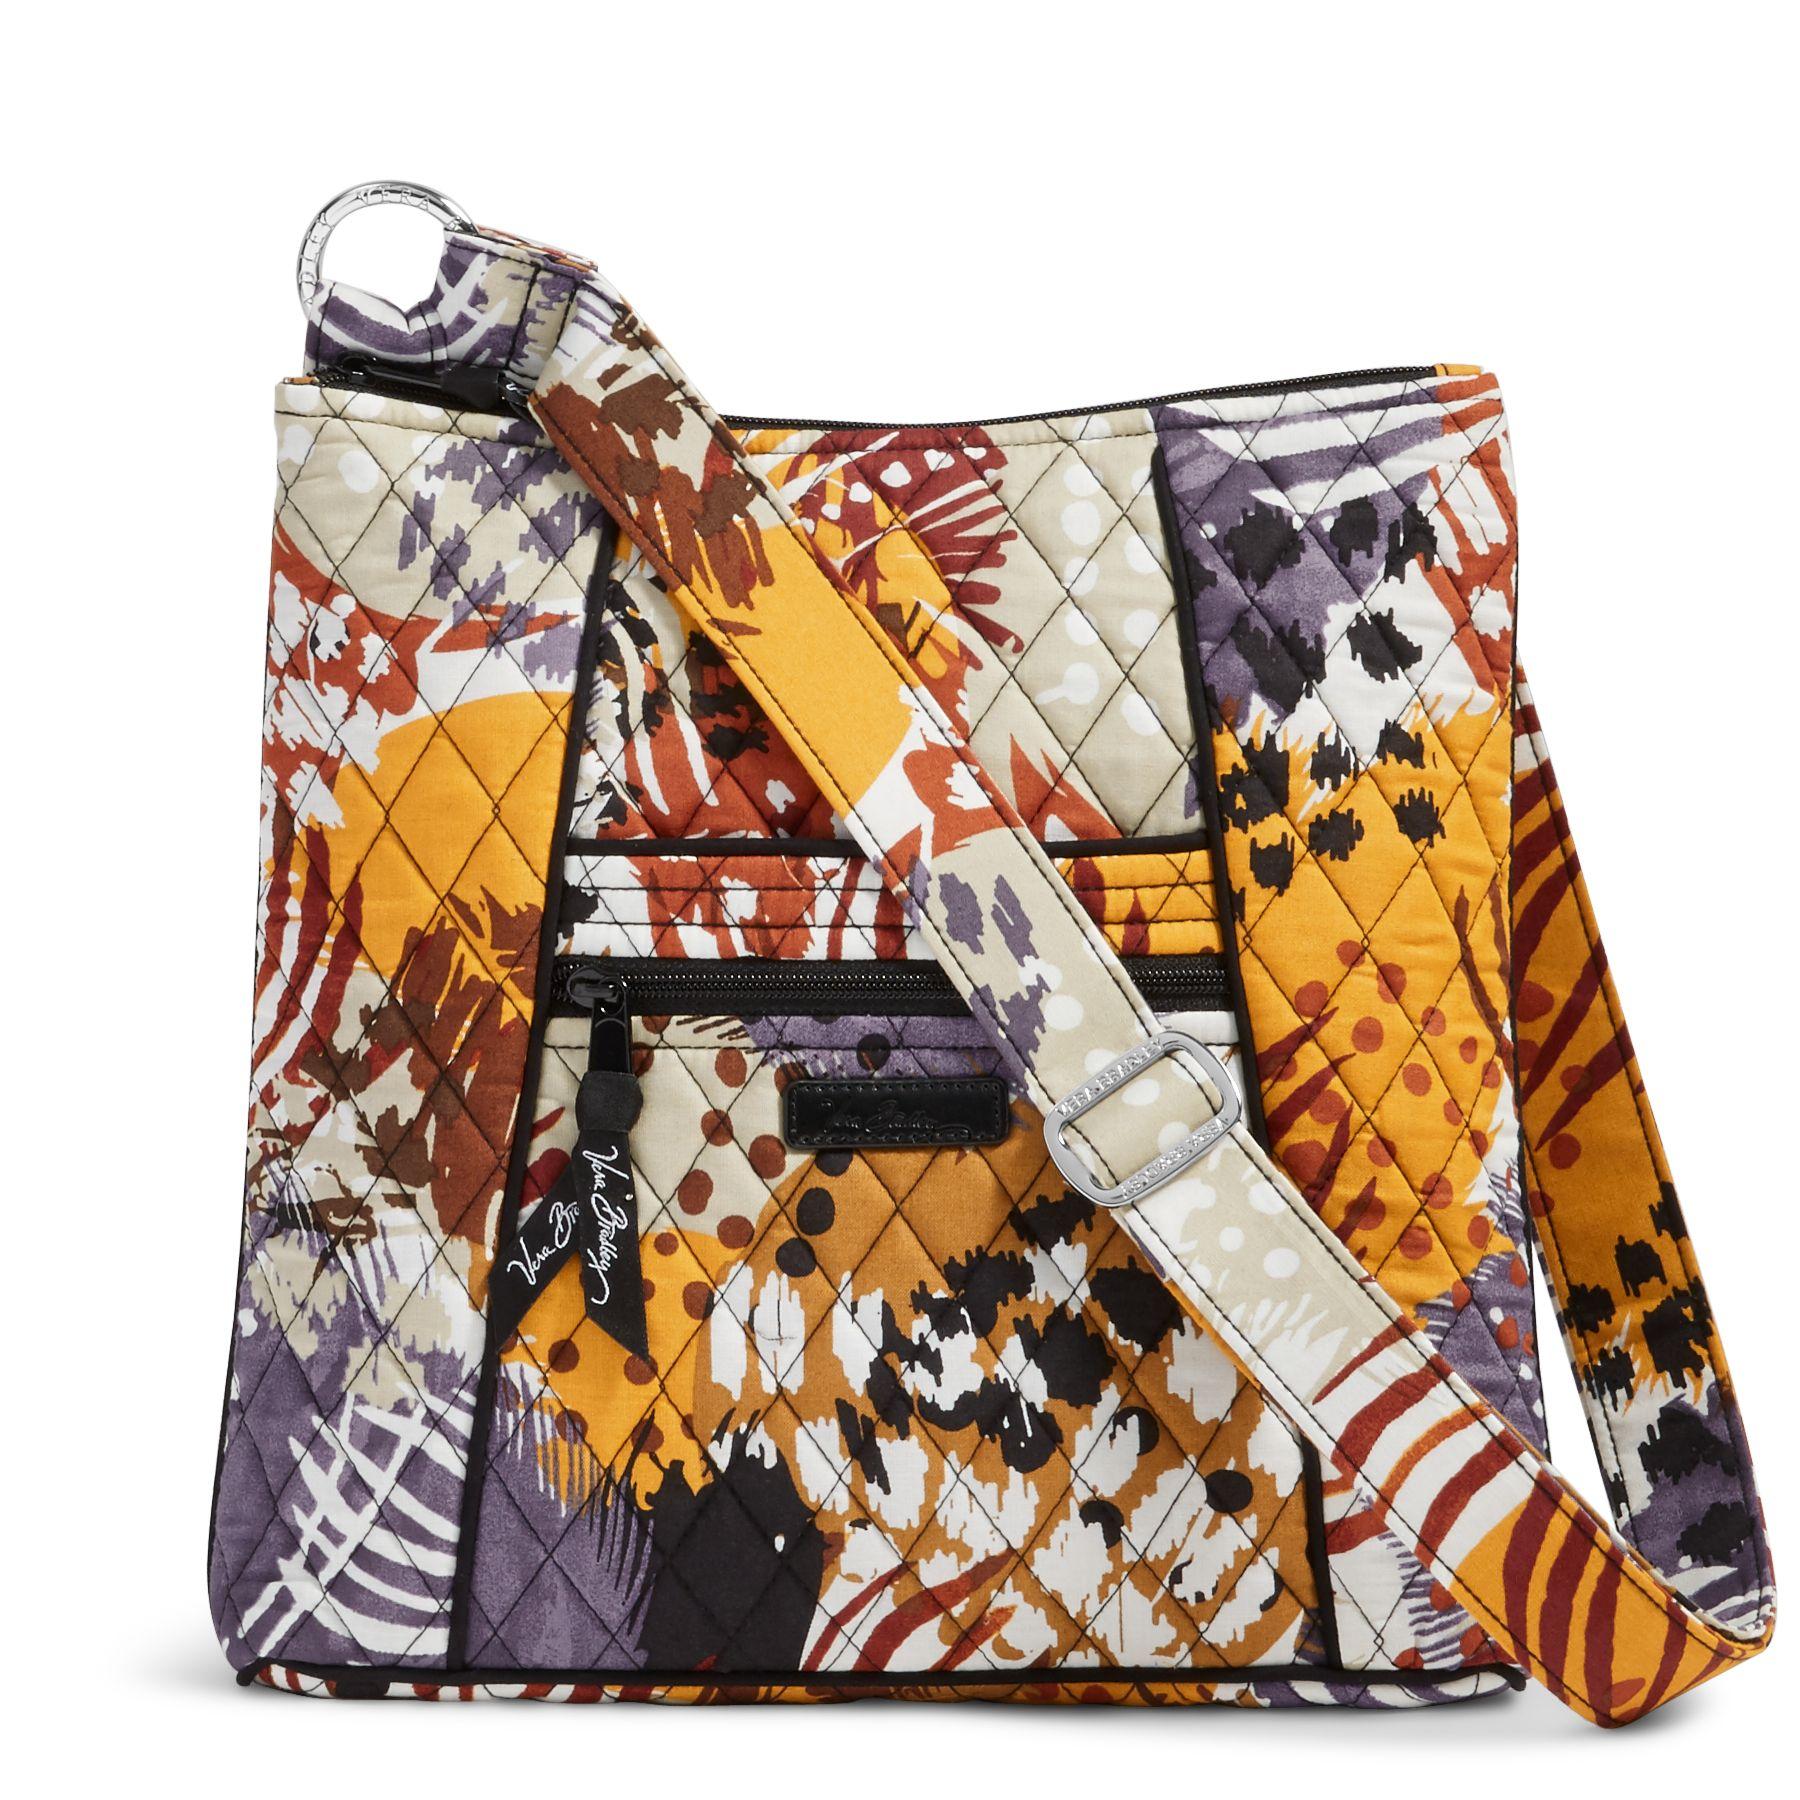 Vera Bradley Painted Feathers Large Hipster Crossbody Purse Handbag ... 1fe58e453c7c9